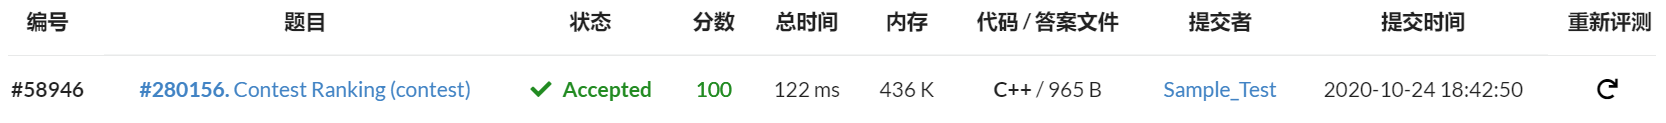 result _58946.png